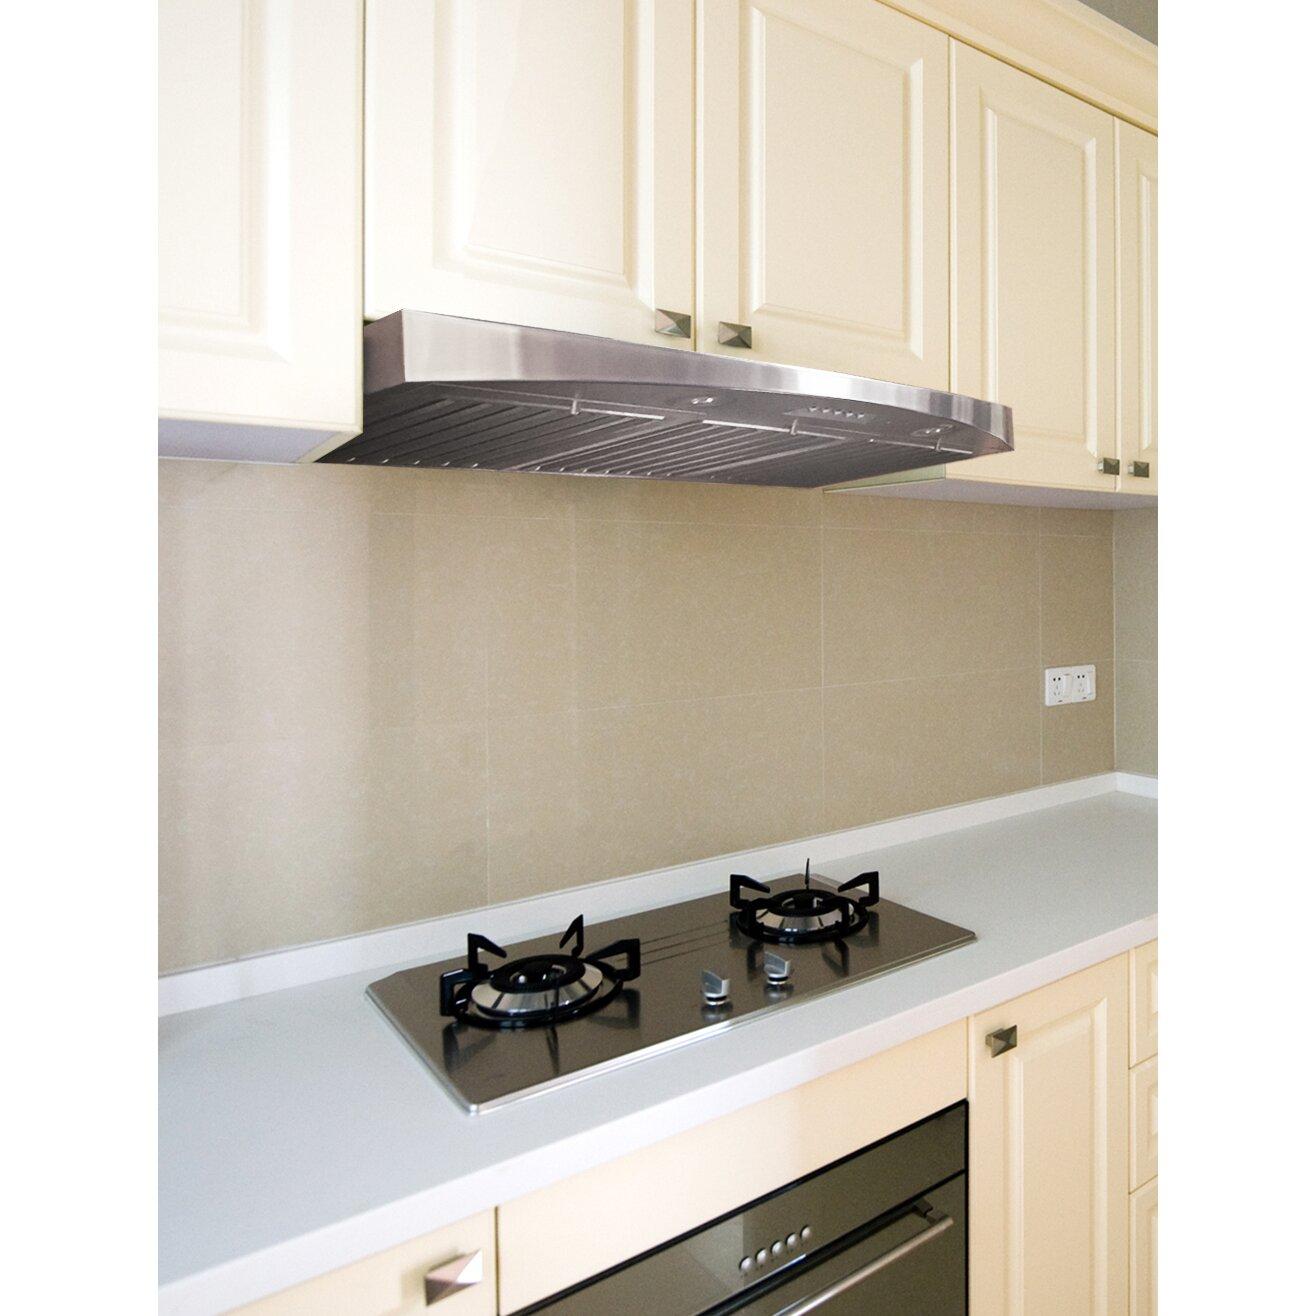 Range Hood Kitchen Kobe Range Hoods Deluxe 30 680 Cfm Under Cabinet Range Hood